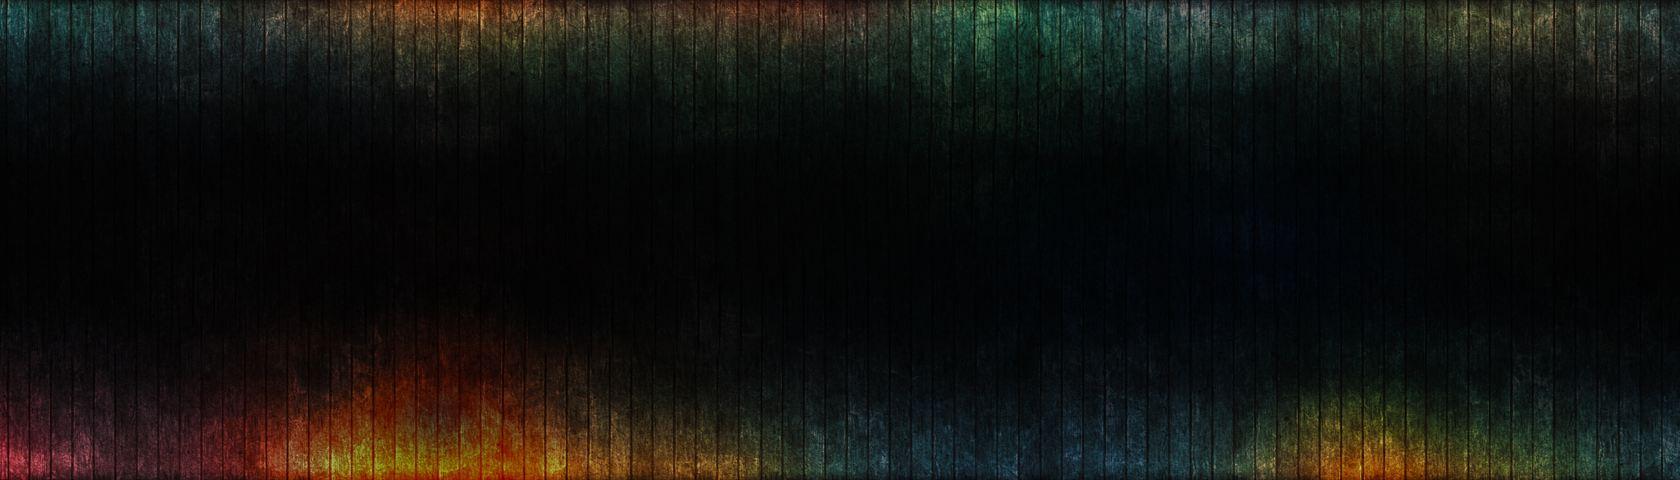 Colorful Boards